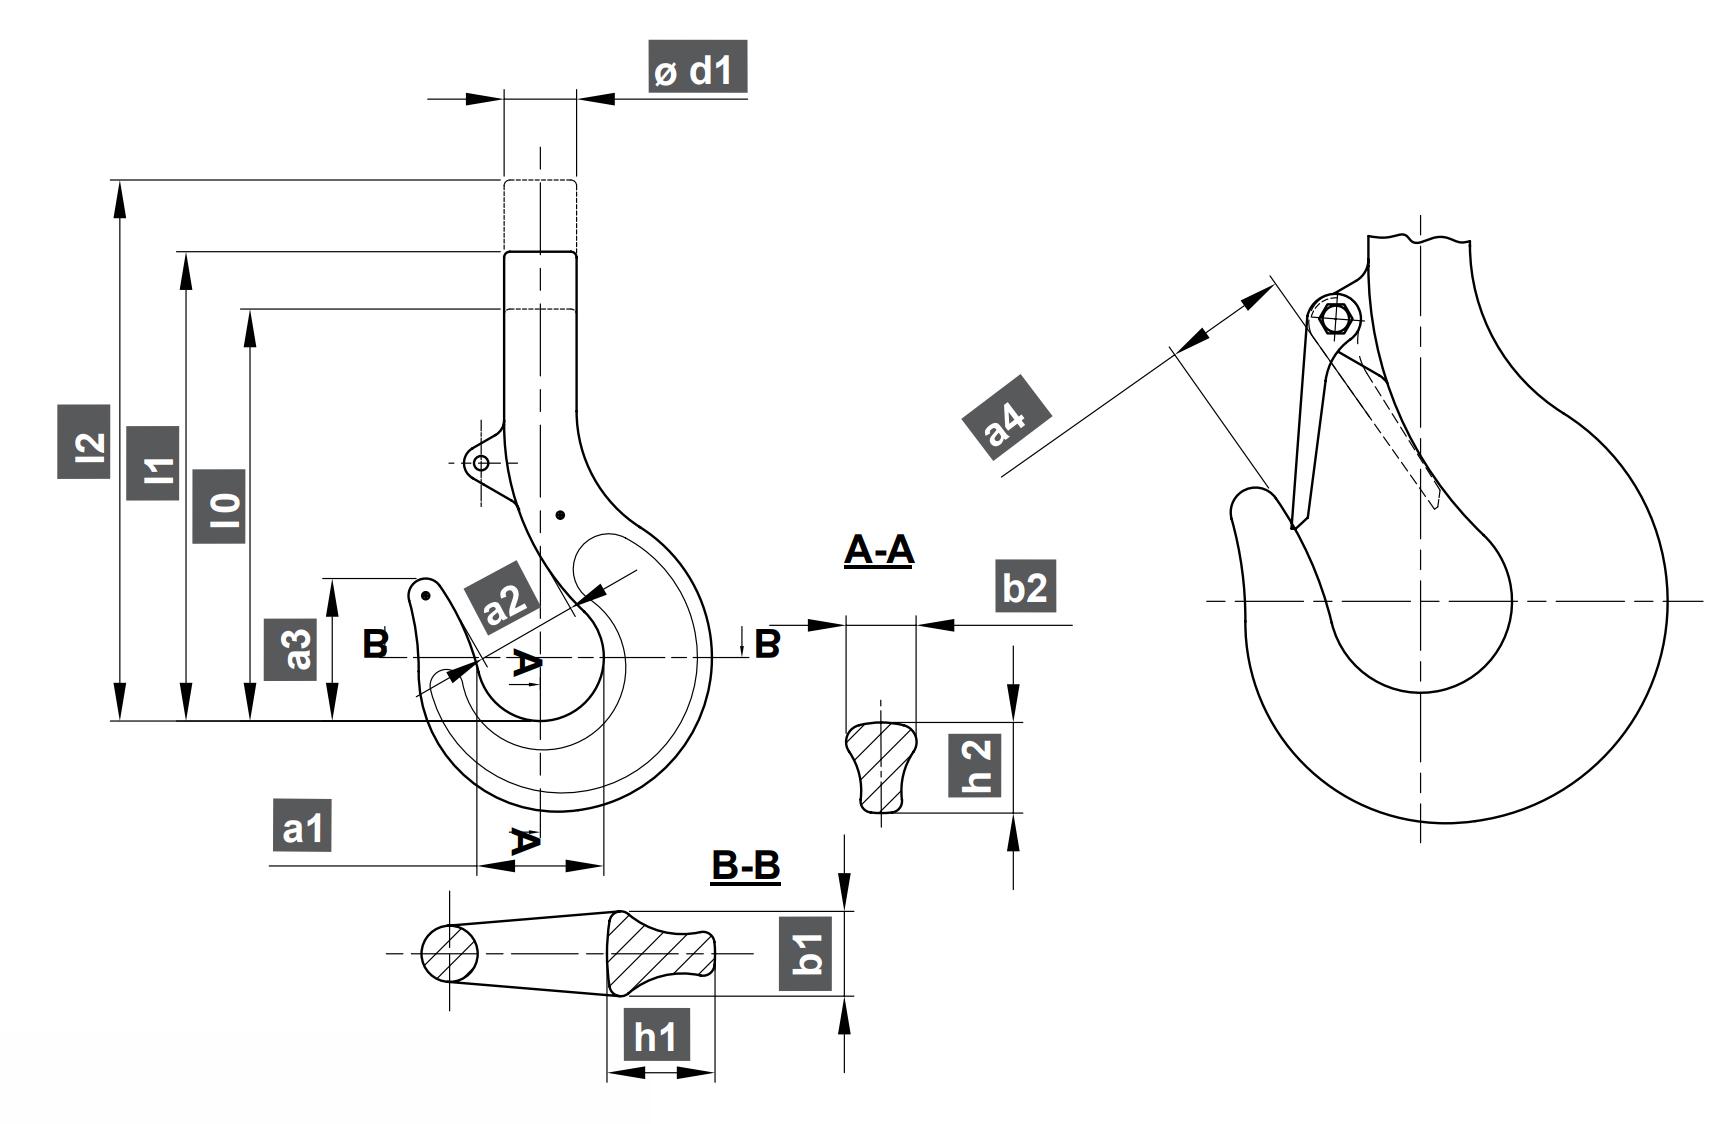 Jednoduchý jeřábový hák RSN - DIN 15401, výkovek bez závitu, s pojistkou, třída P